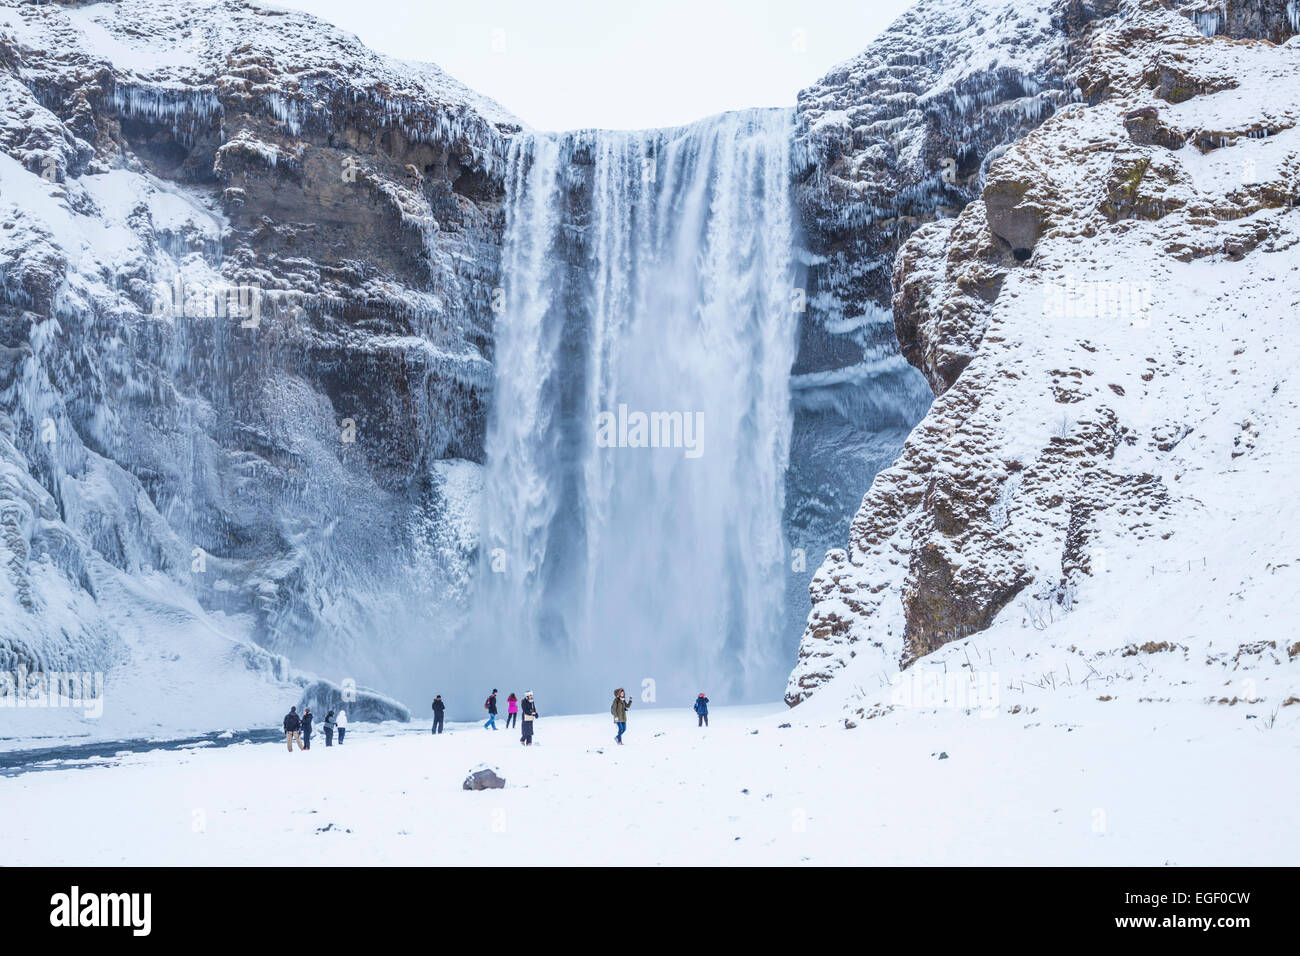 Tourists visiting Skogafoss waterfall in winter Skogar South Iceland Iceland Europe - Stock Image